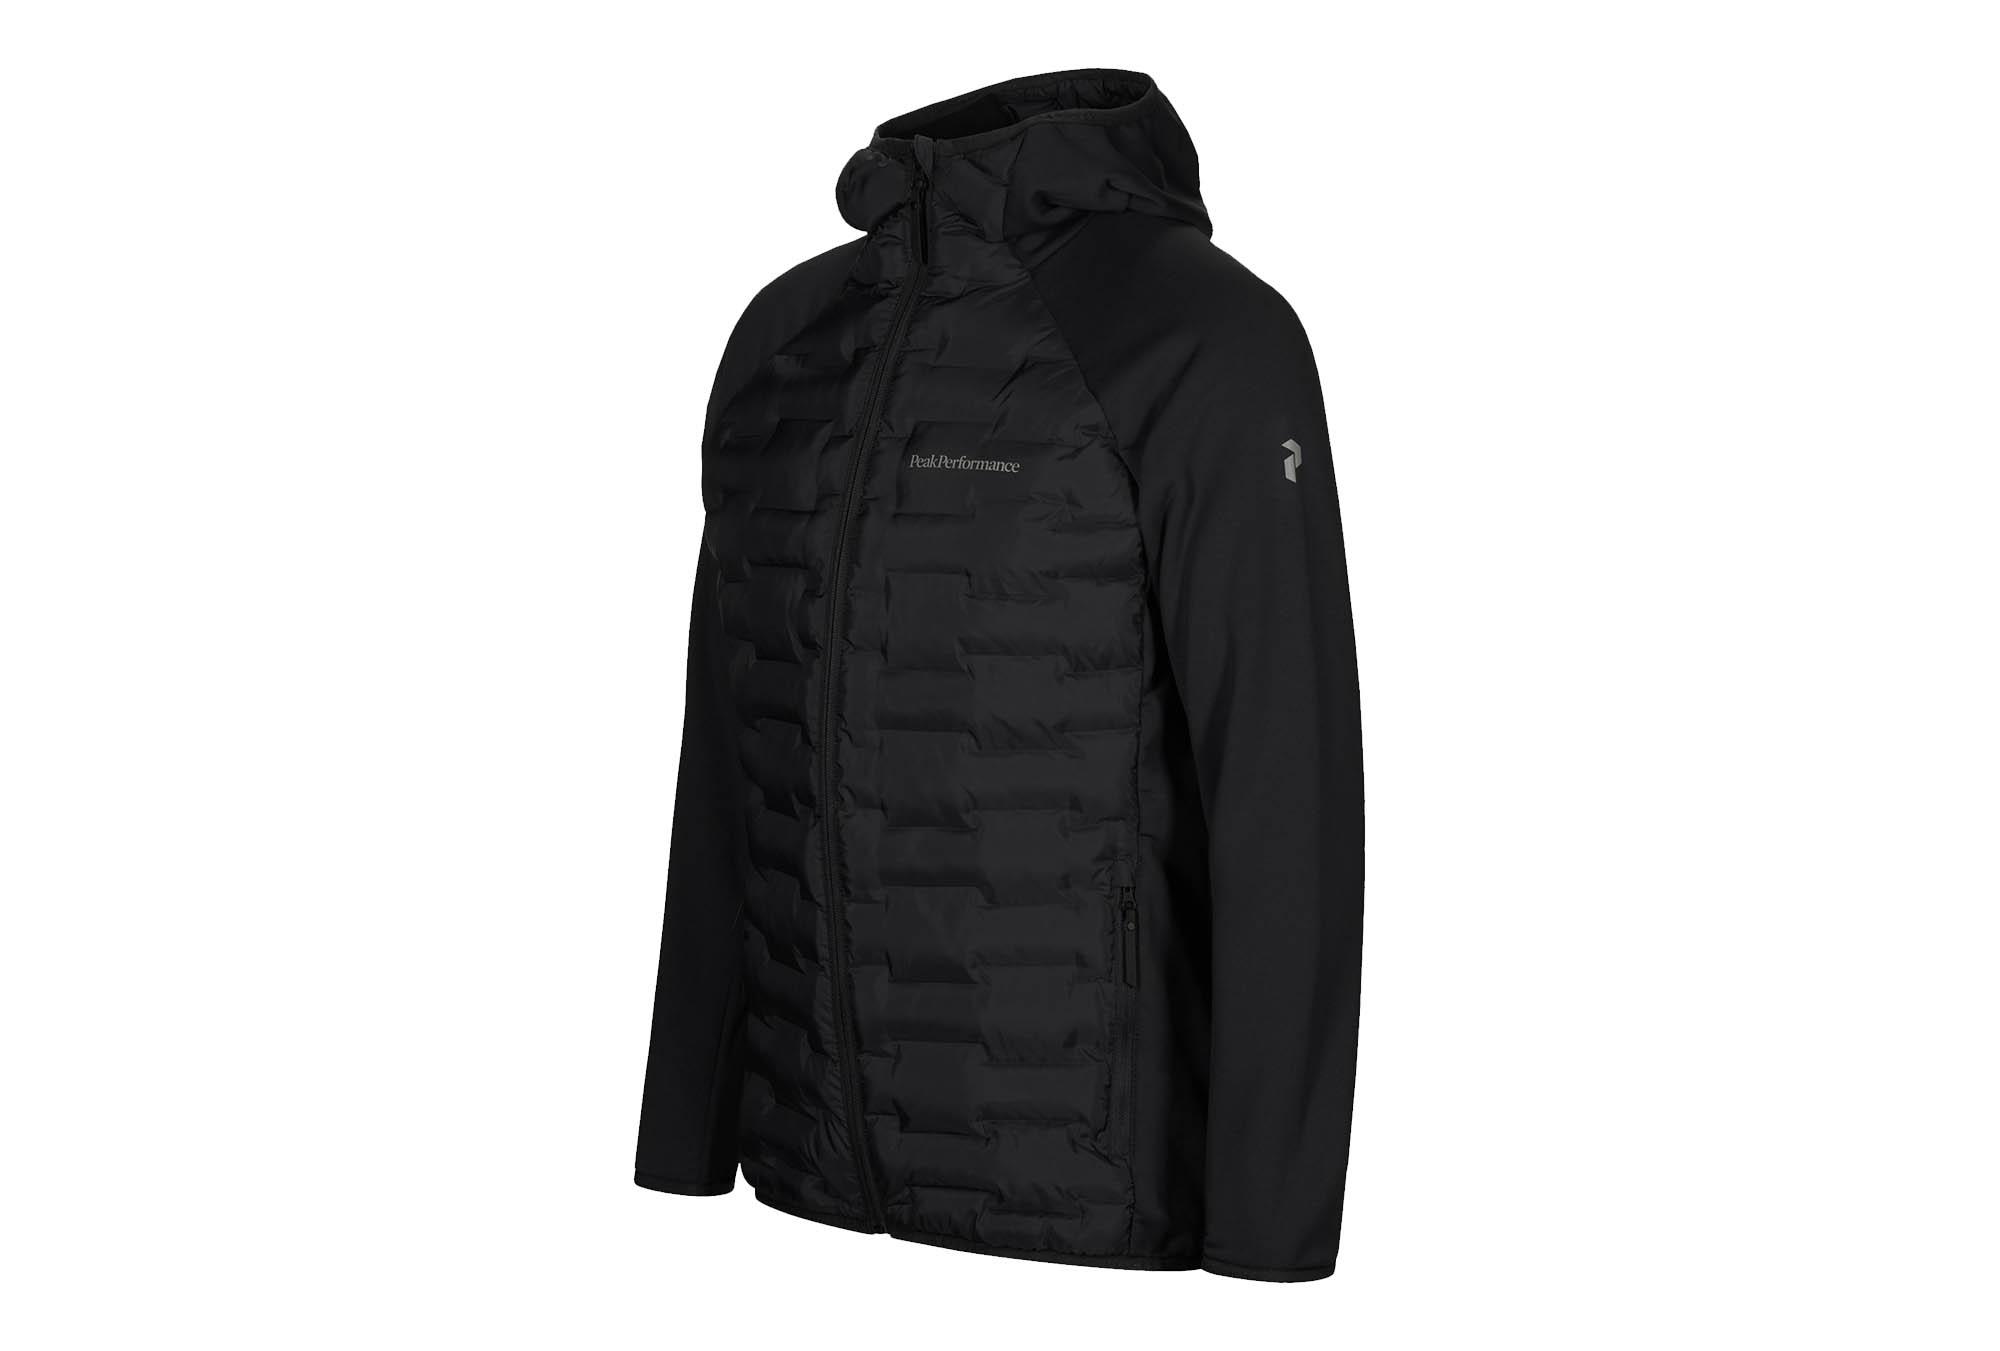 Winter 2020 Peak Performance World of Outdoor Sonthofen Allgäu Sportgeschäft Argon Hybrid Hood Jacket Black n